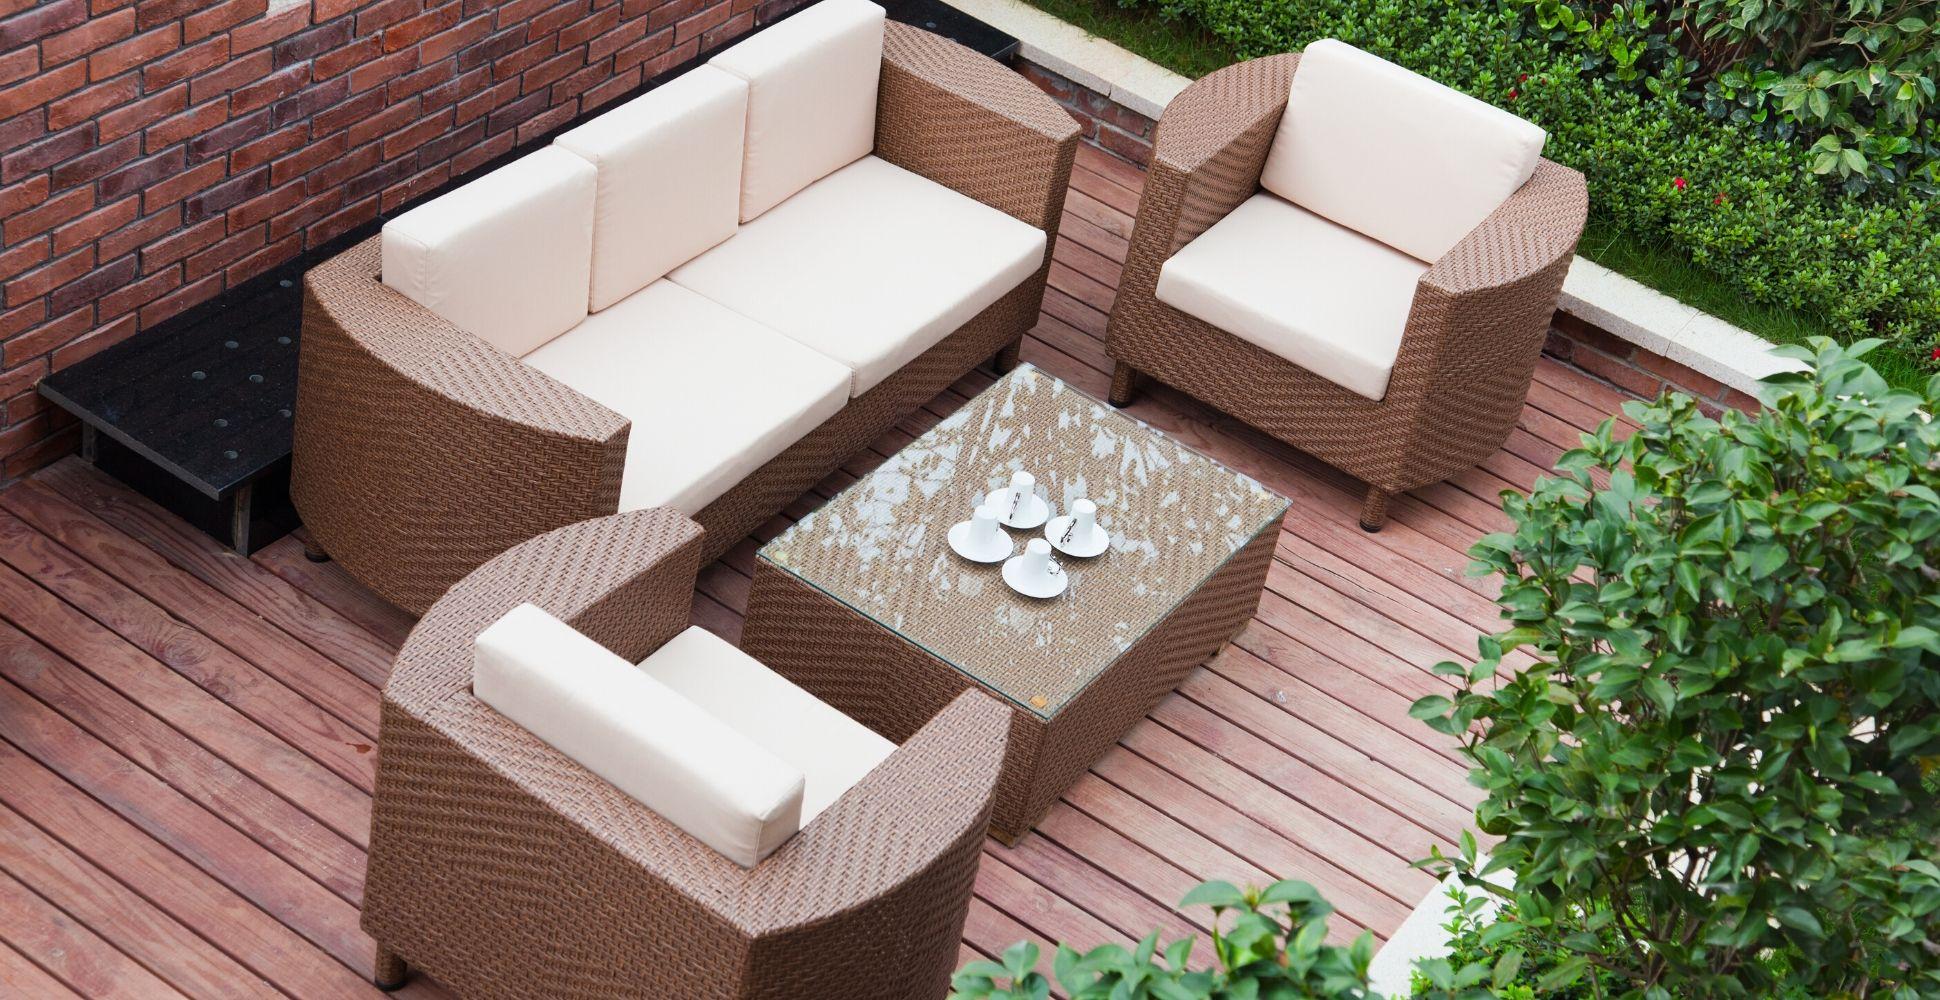 5 Best Brown Rattan Garden Furniture Sets (Aug 2020 Review)